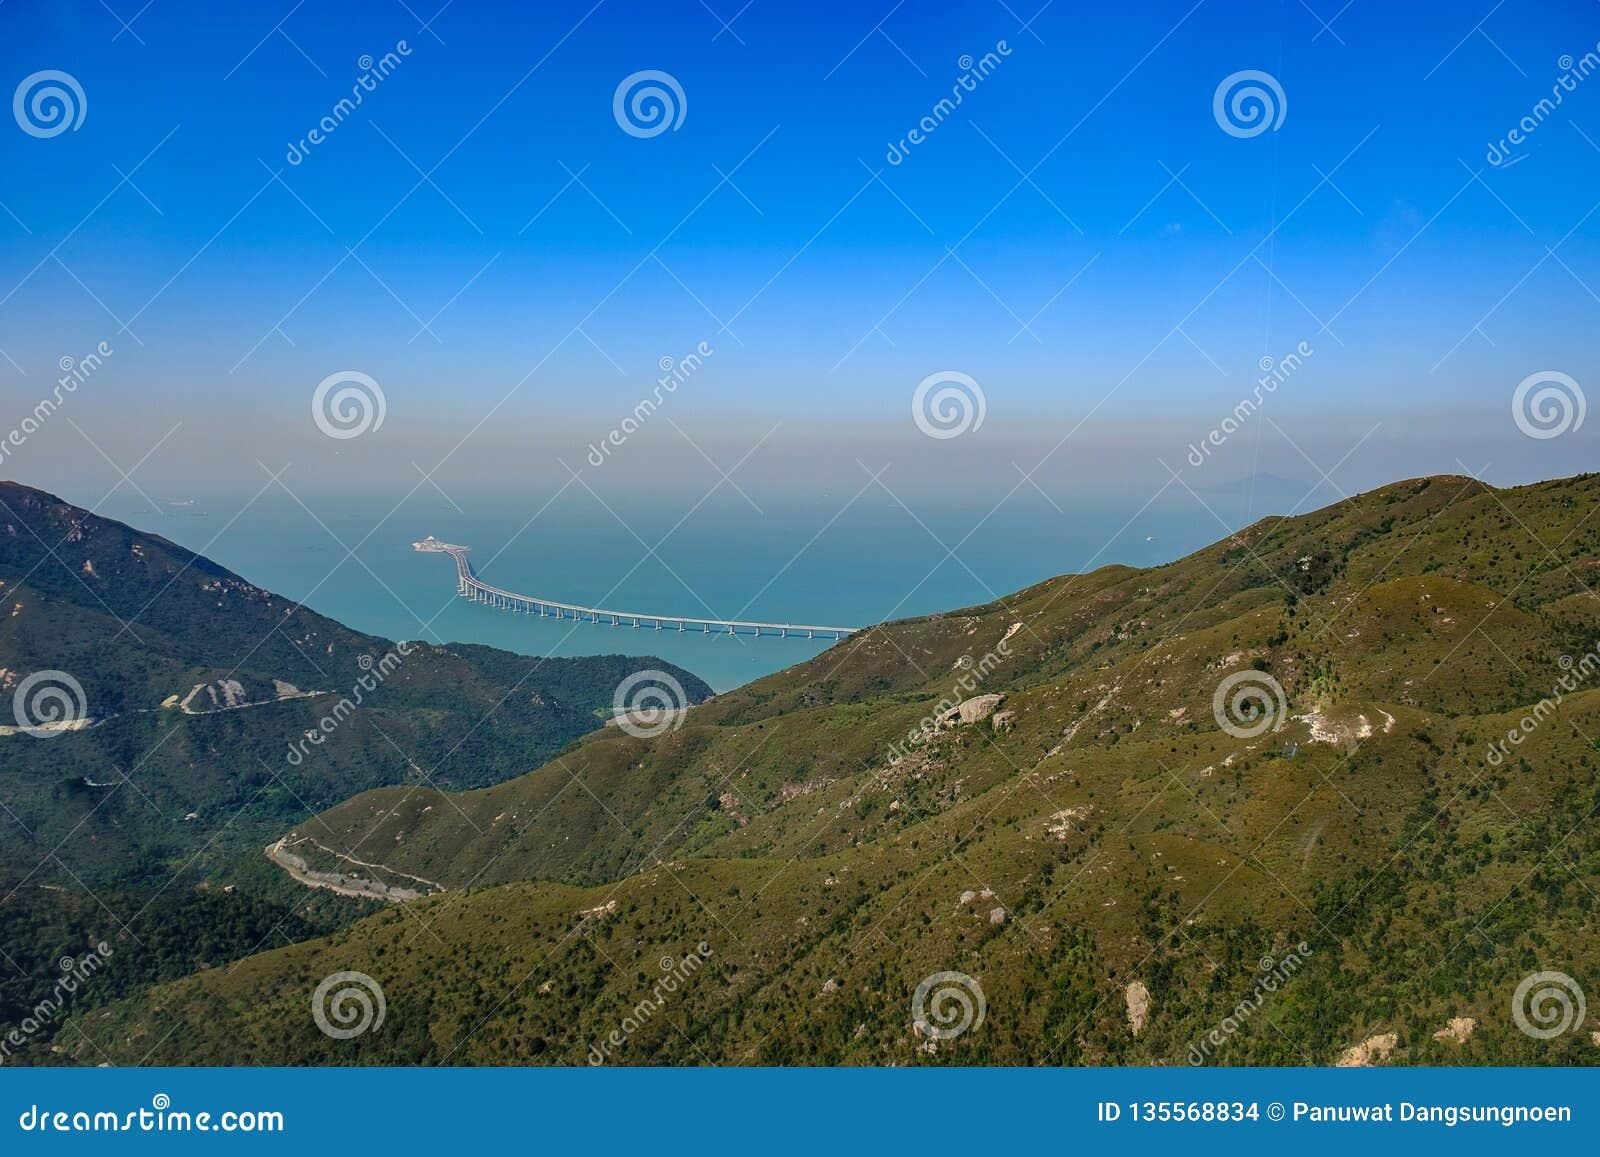 Hong Kong krajobraz, widok z lotu ptaka